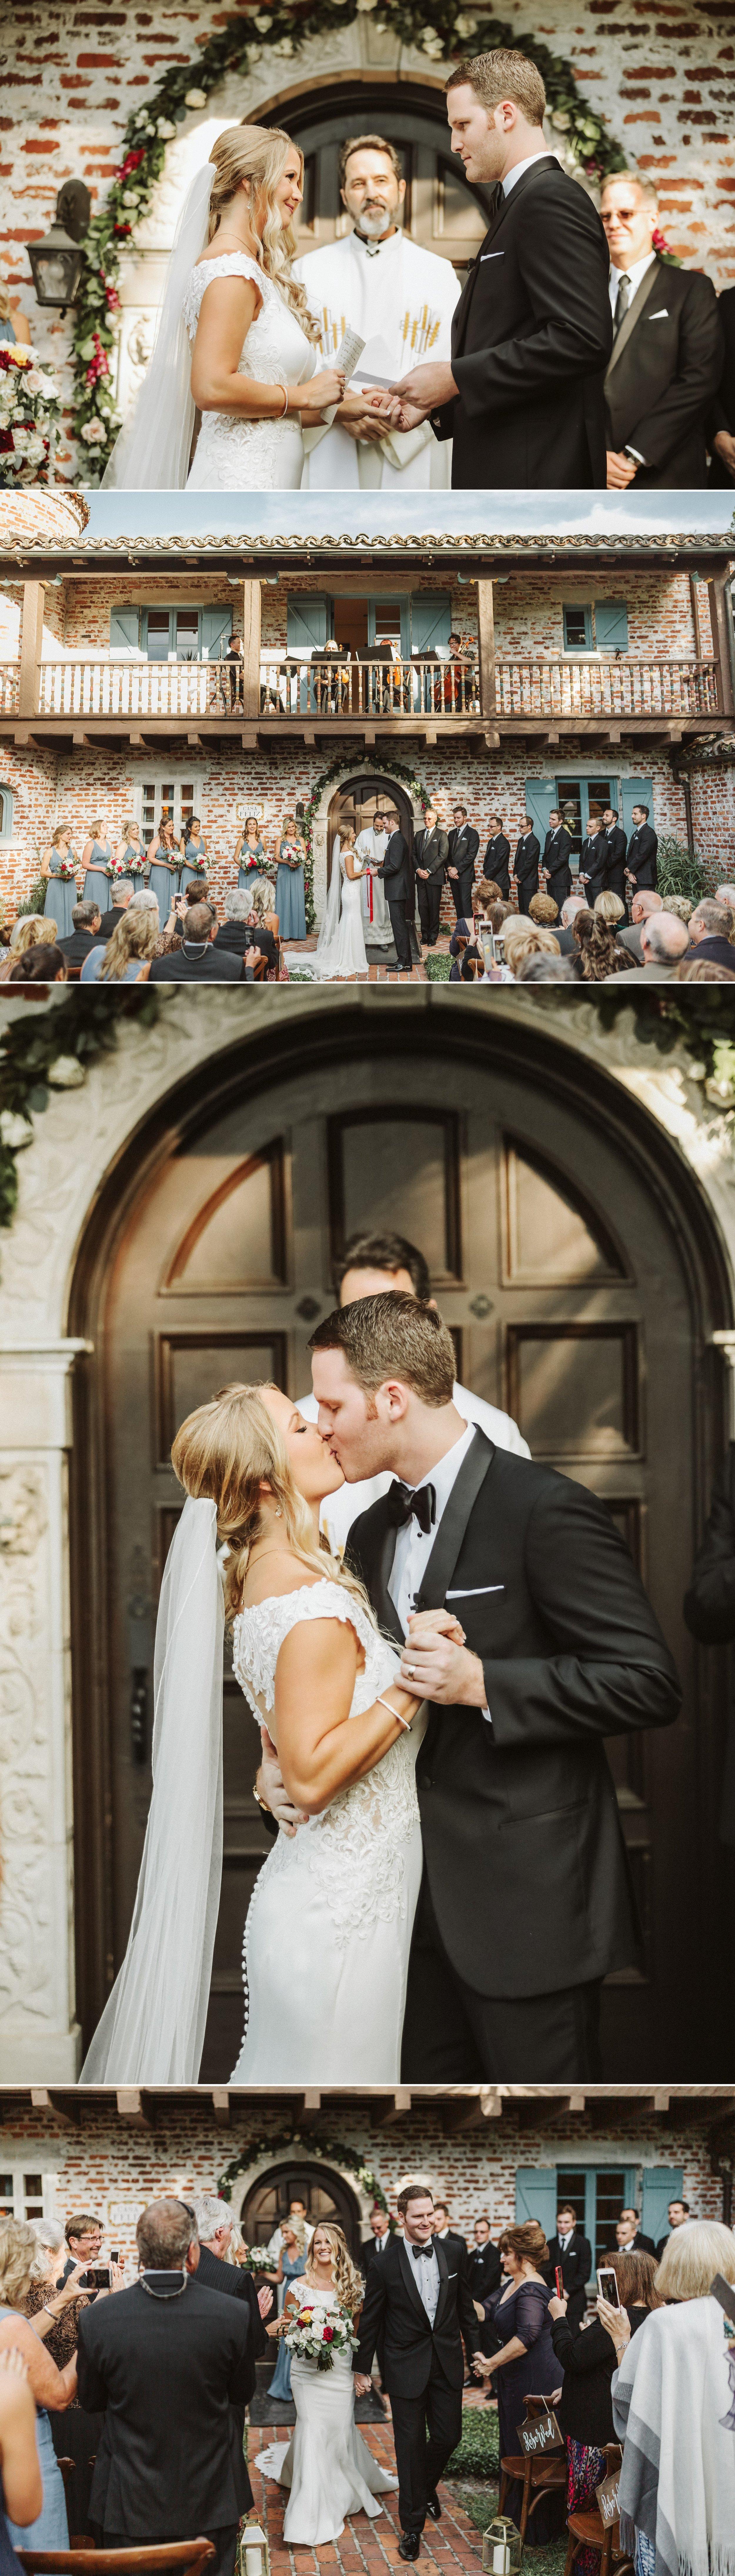 Casa Feliz Romantic Black Tie Wedding- Nick + Marissa- by Shaina DeCiryan Photography5.jpg